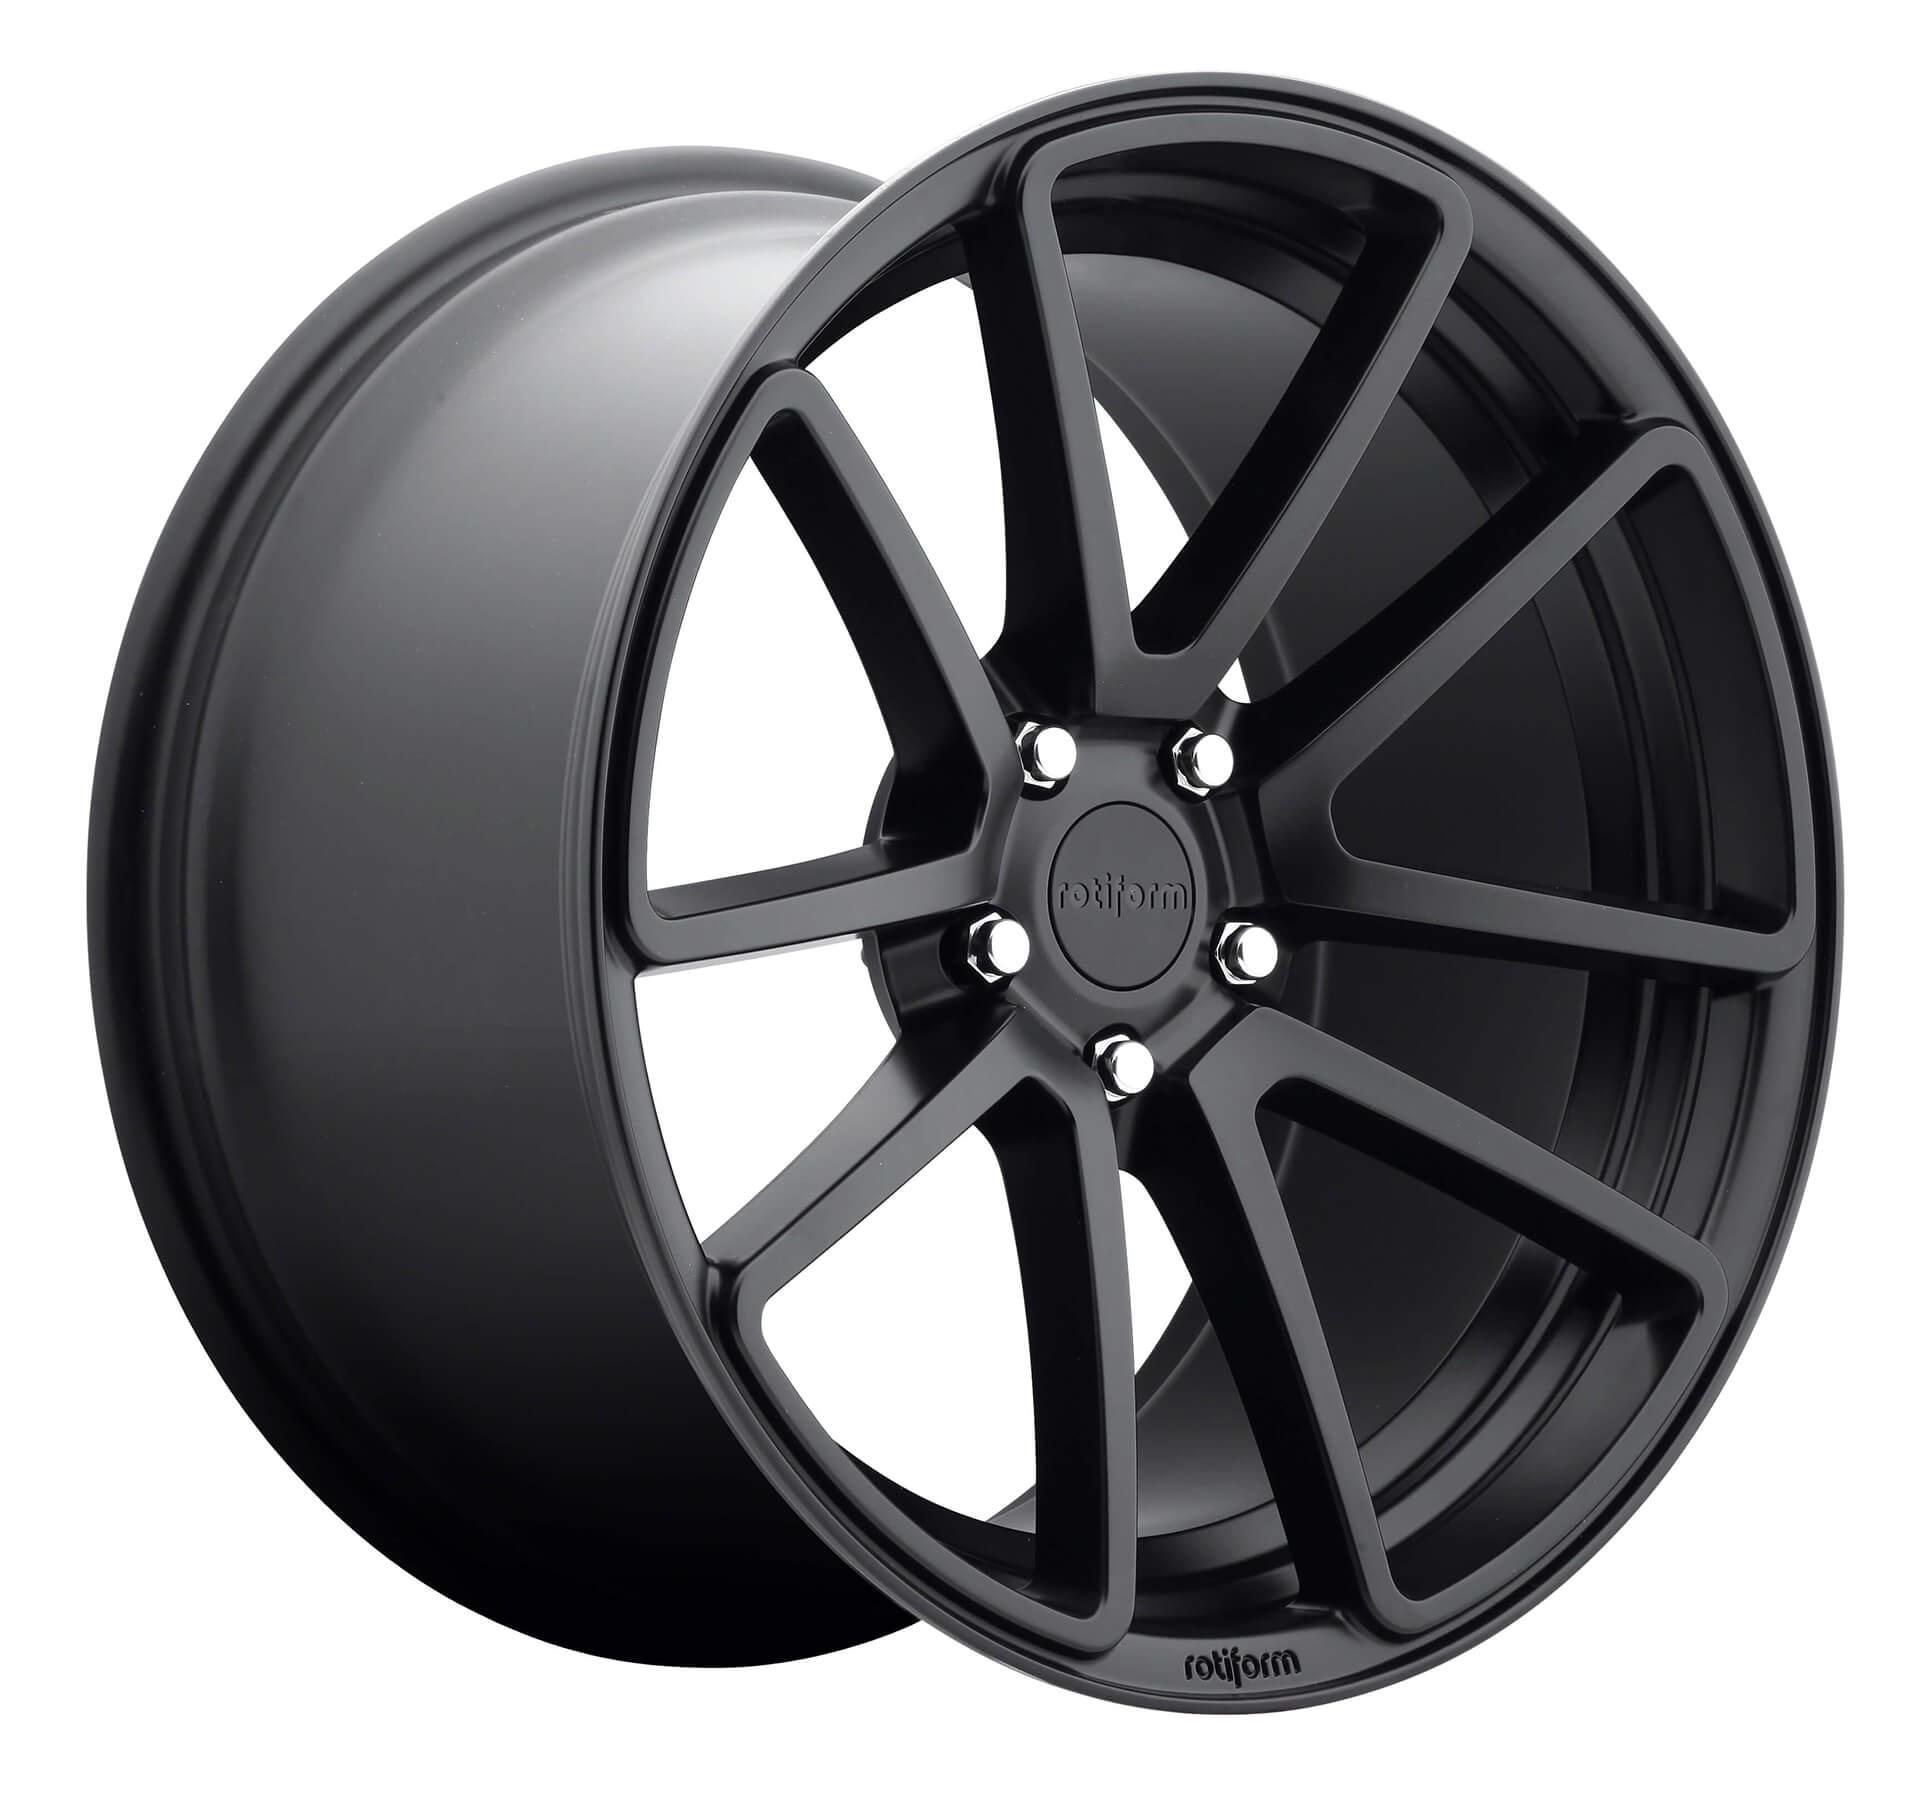 Rotiform Monoblock Wheel - SPF Cast 1 Piece